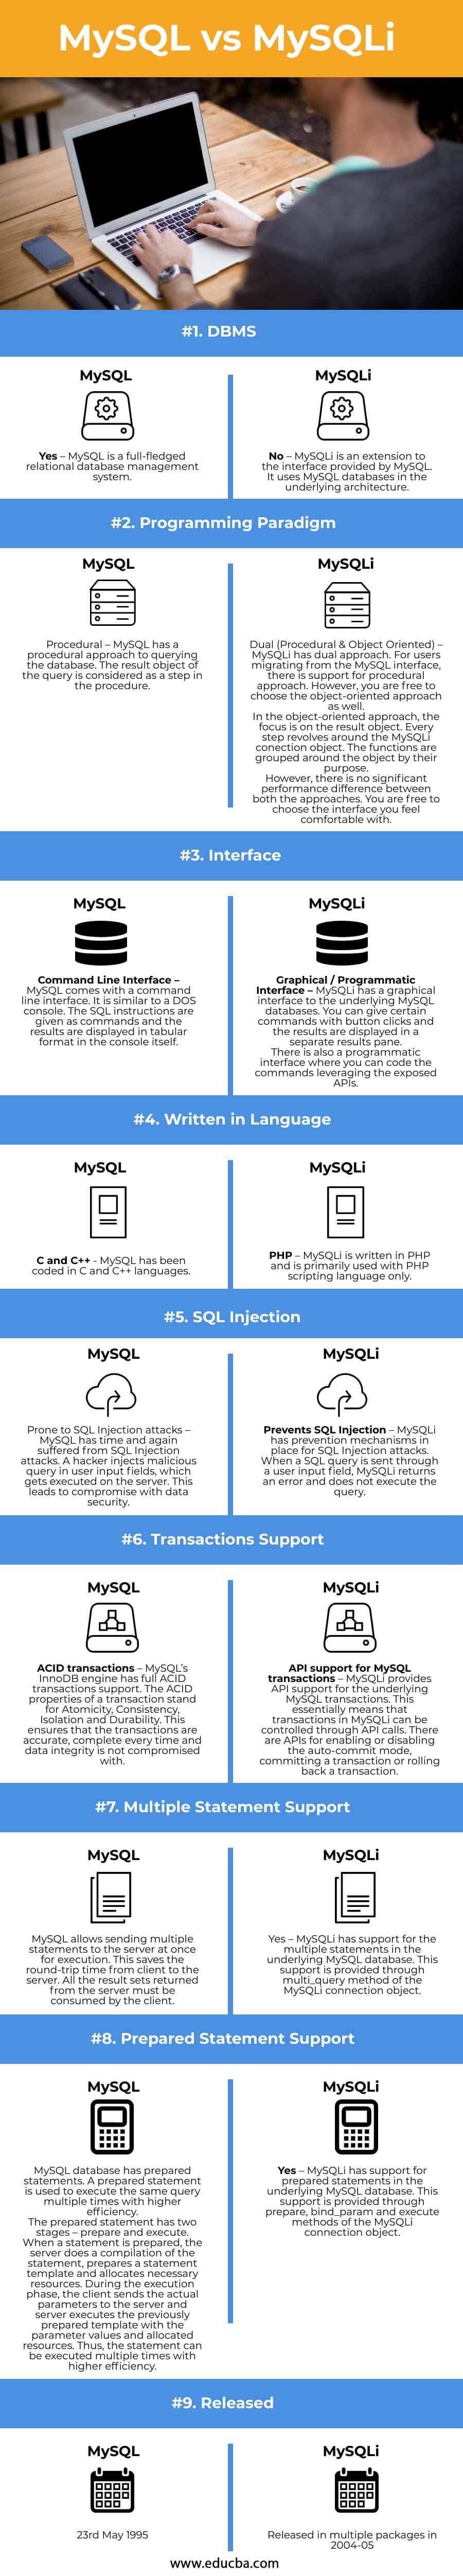 MySQL-vs-MySQLi-info